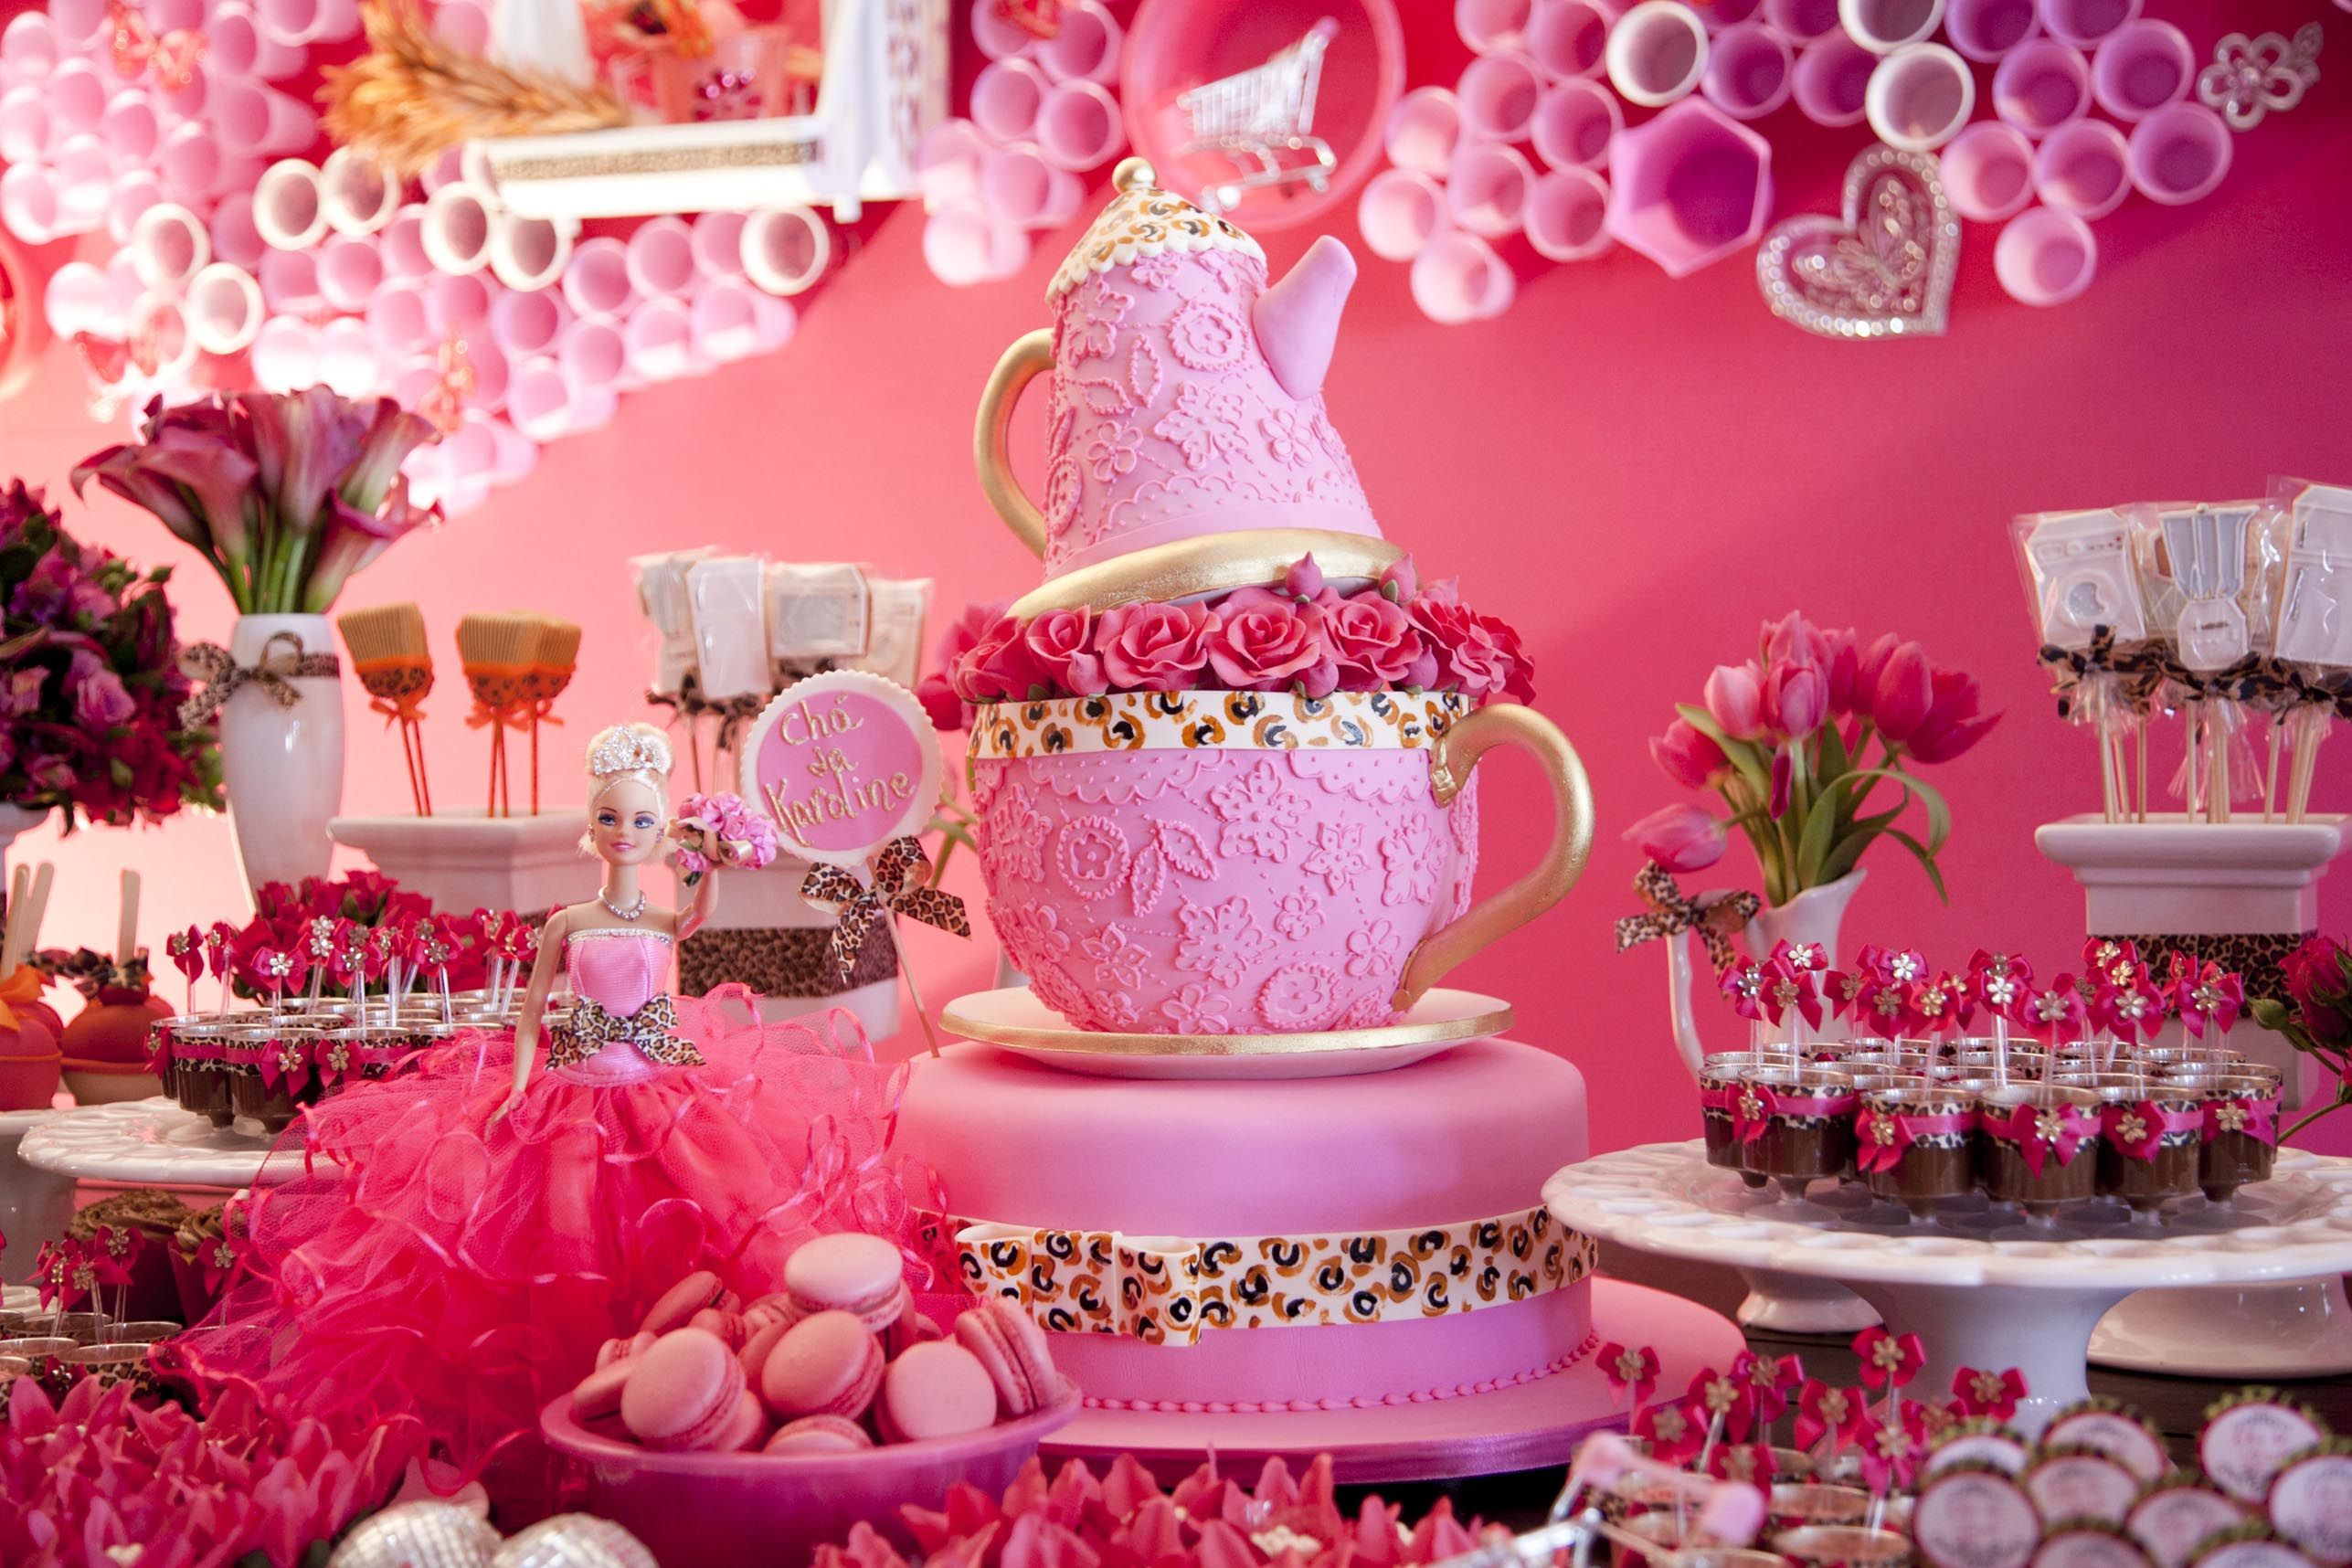 Tea Party Cake Legal Para Ch De Panela Tamb M Cake